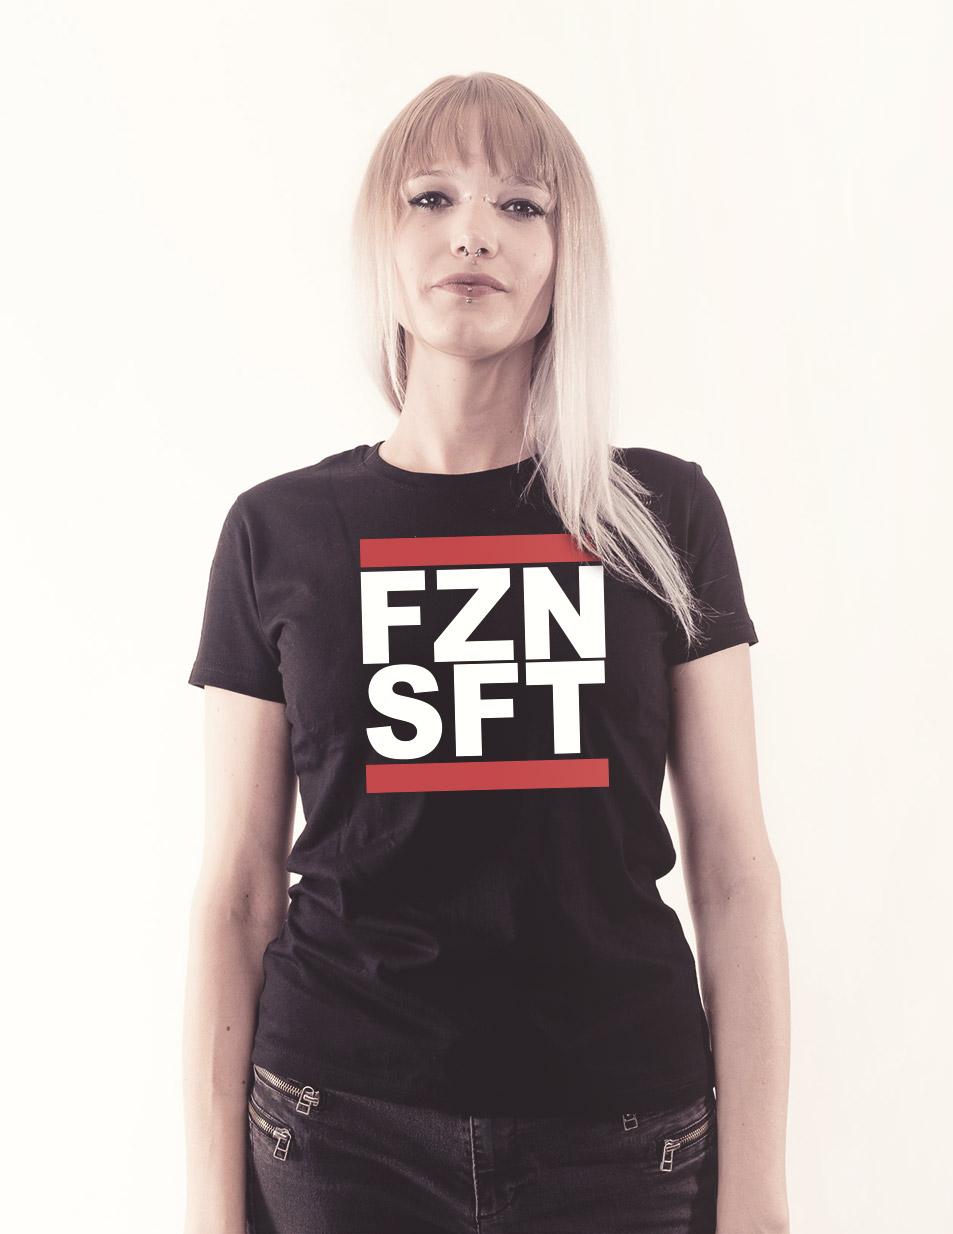 FZNSFT Girly Shirt mehrfarbig auf schwarz